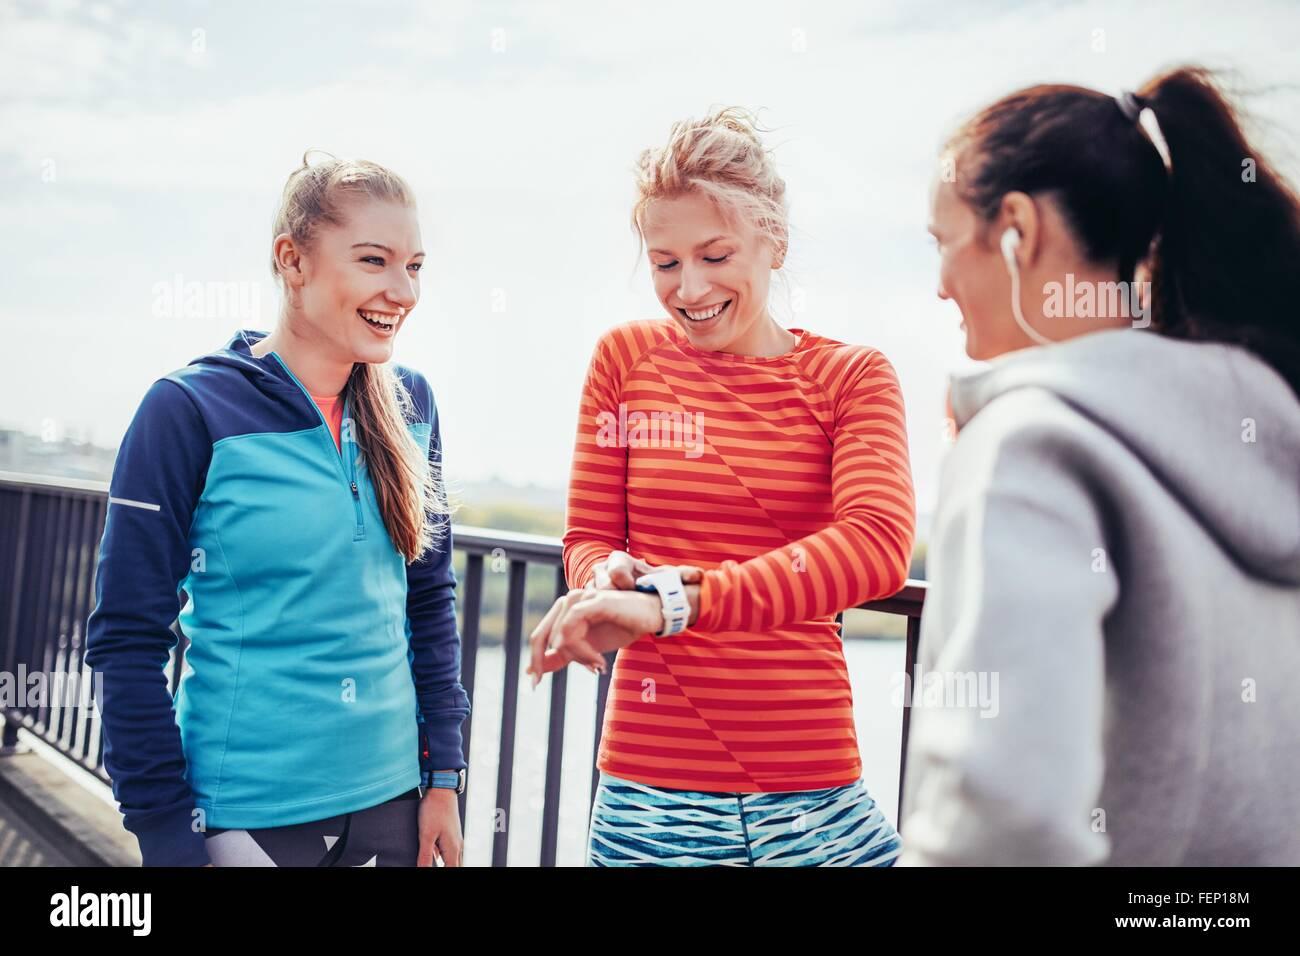 Three female runners coordinating time on city footbridge - Stock Image